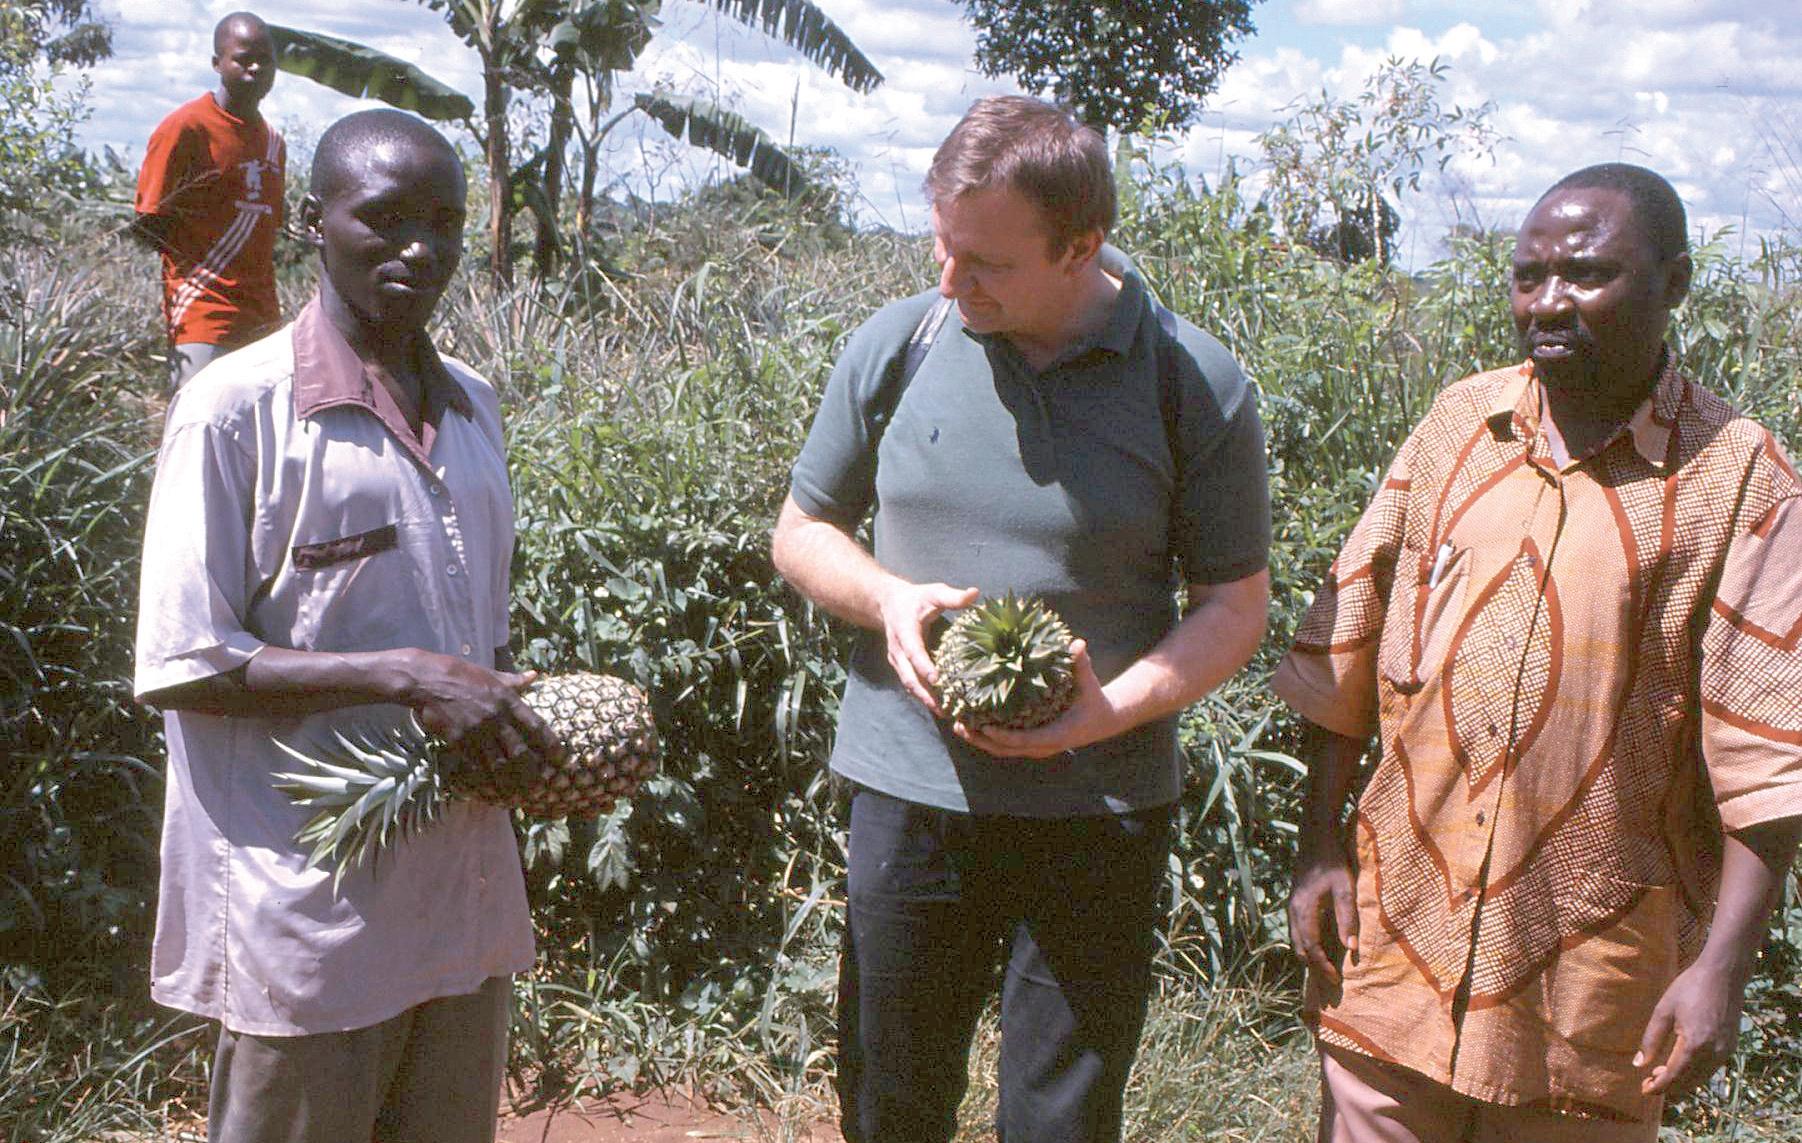 BioUganda Ltd. Ananasplantage